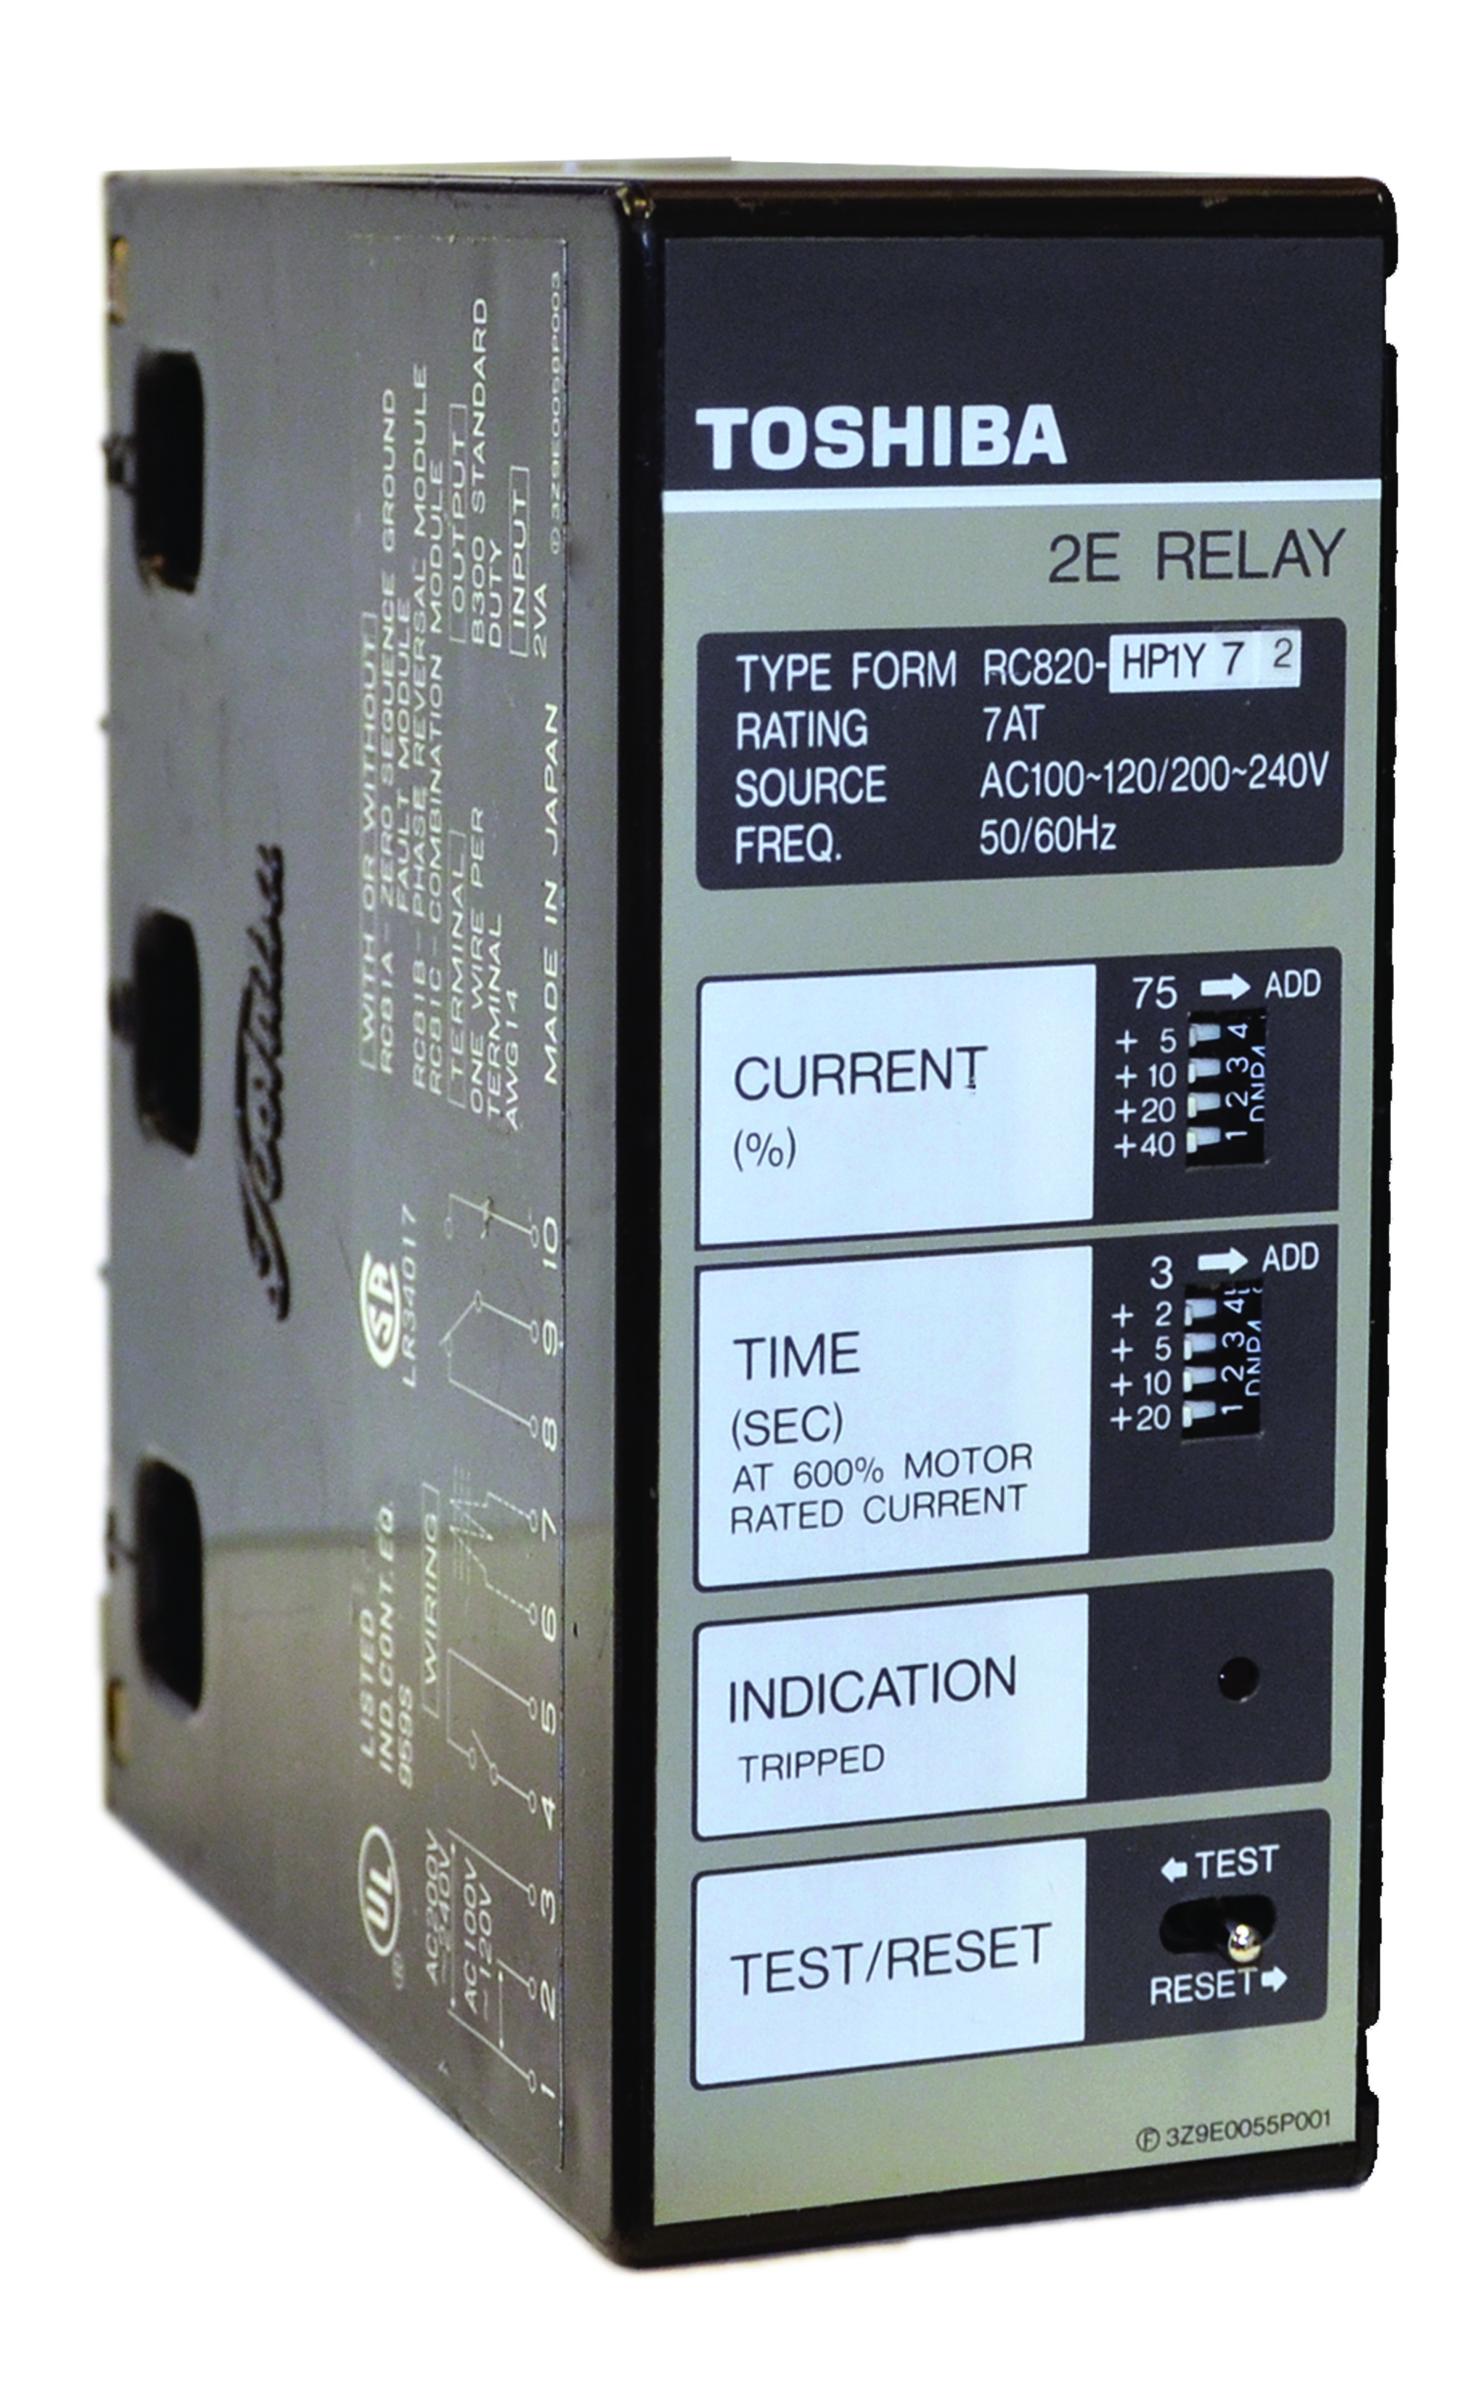 Neamen Solution Manual Transmission Diagram A543 In A Caravan Am I Crazy No Just Array Toshiba Satellite A200 21t Rh Lecraic